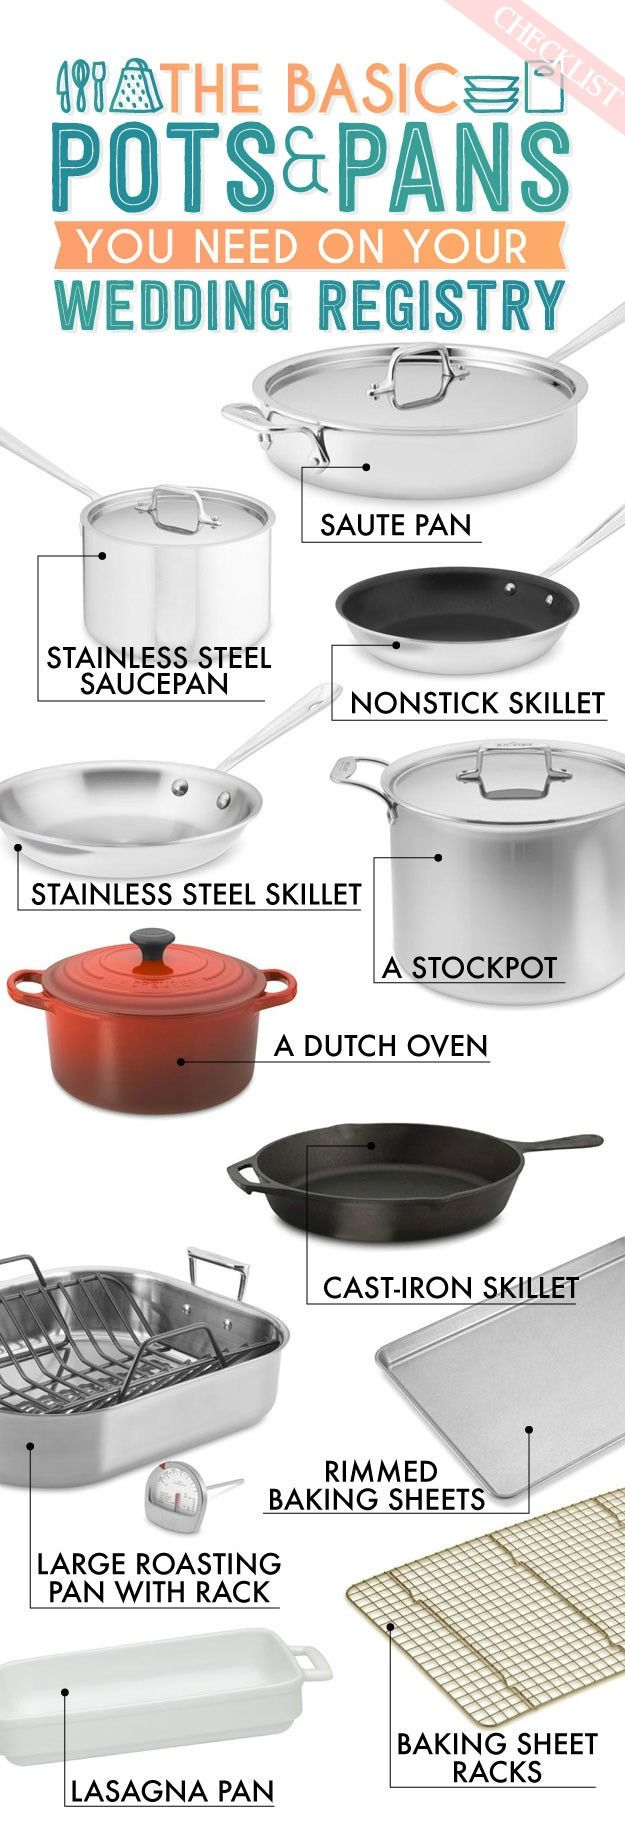 Checklist Pots and Pans Wedding registry checklist